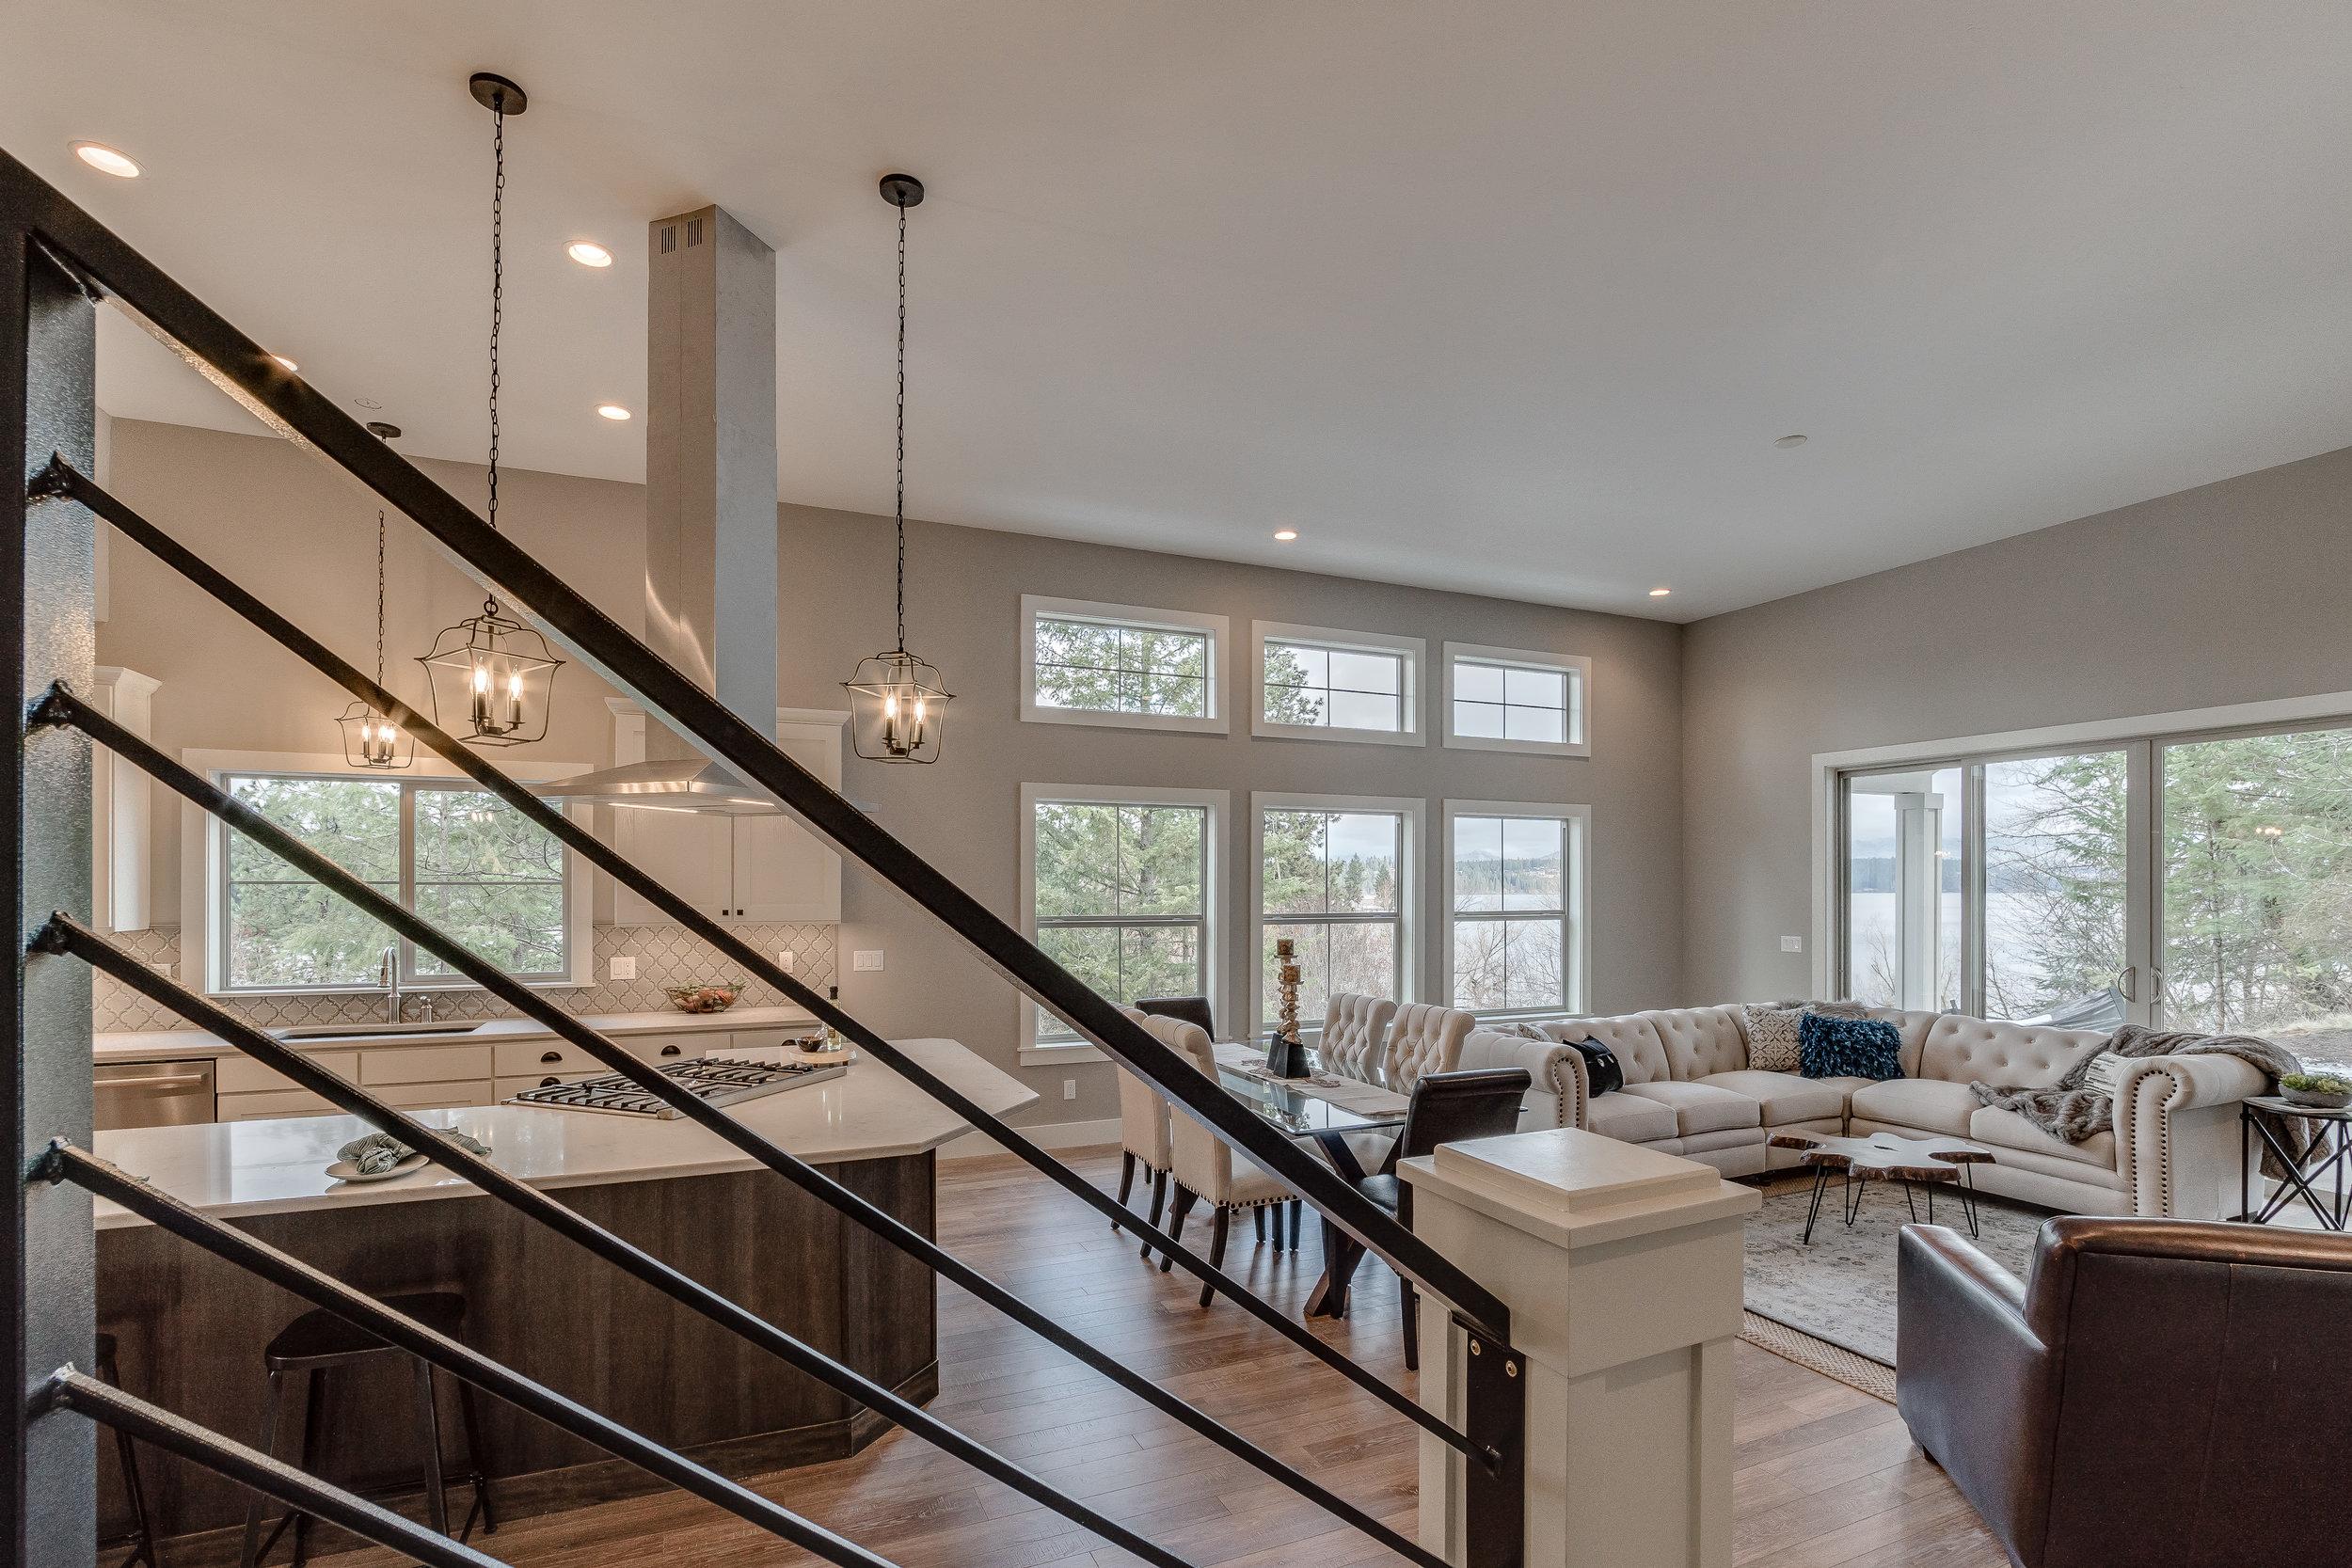 31Stairs & kitchen-FULL.jpg